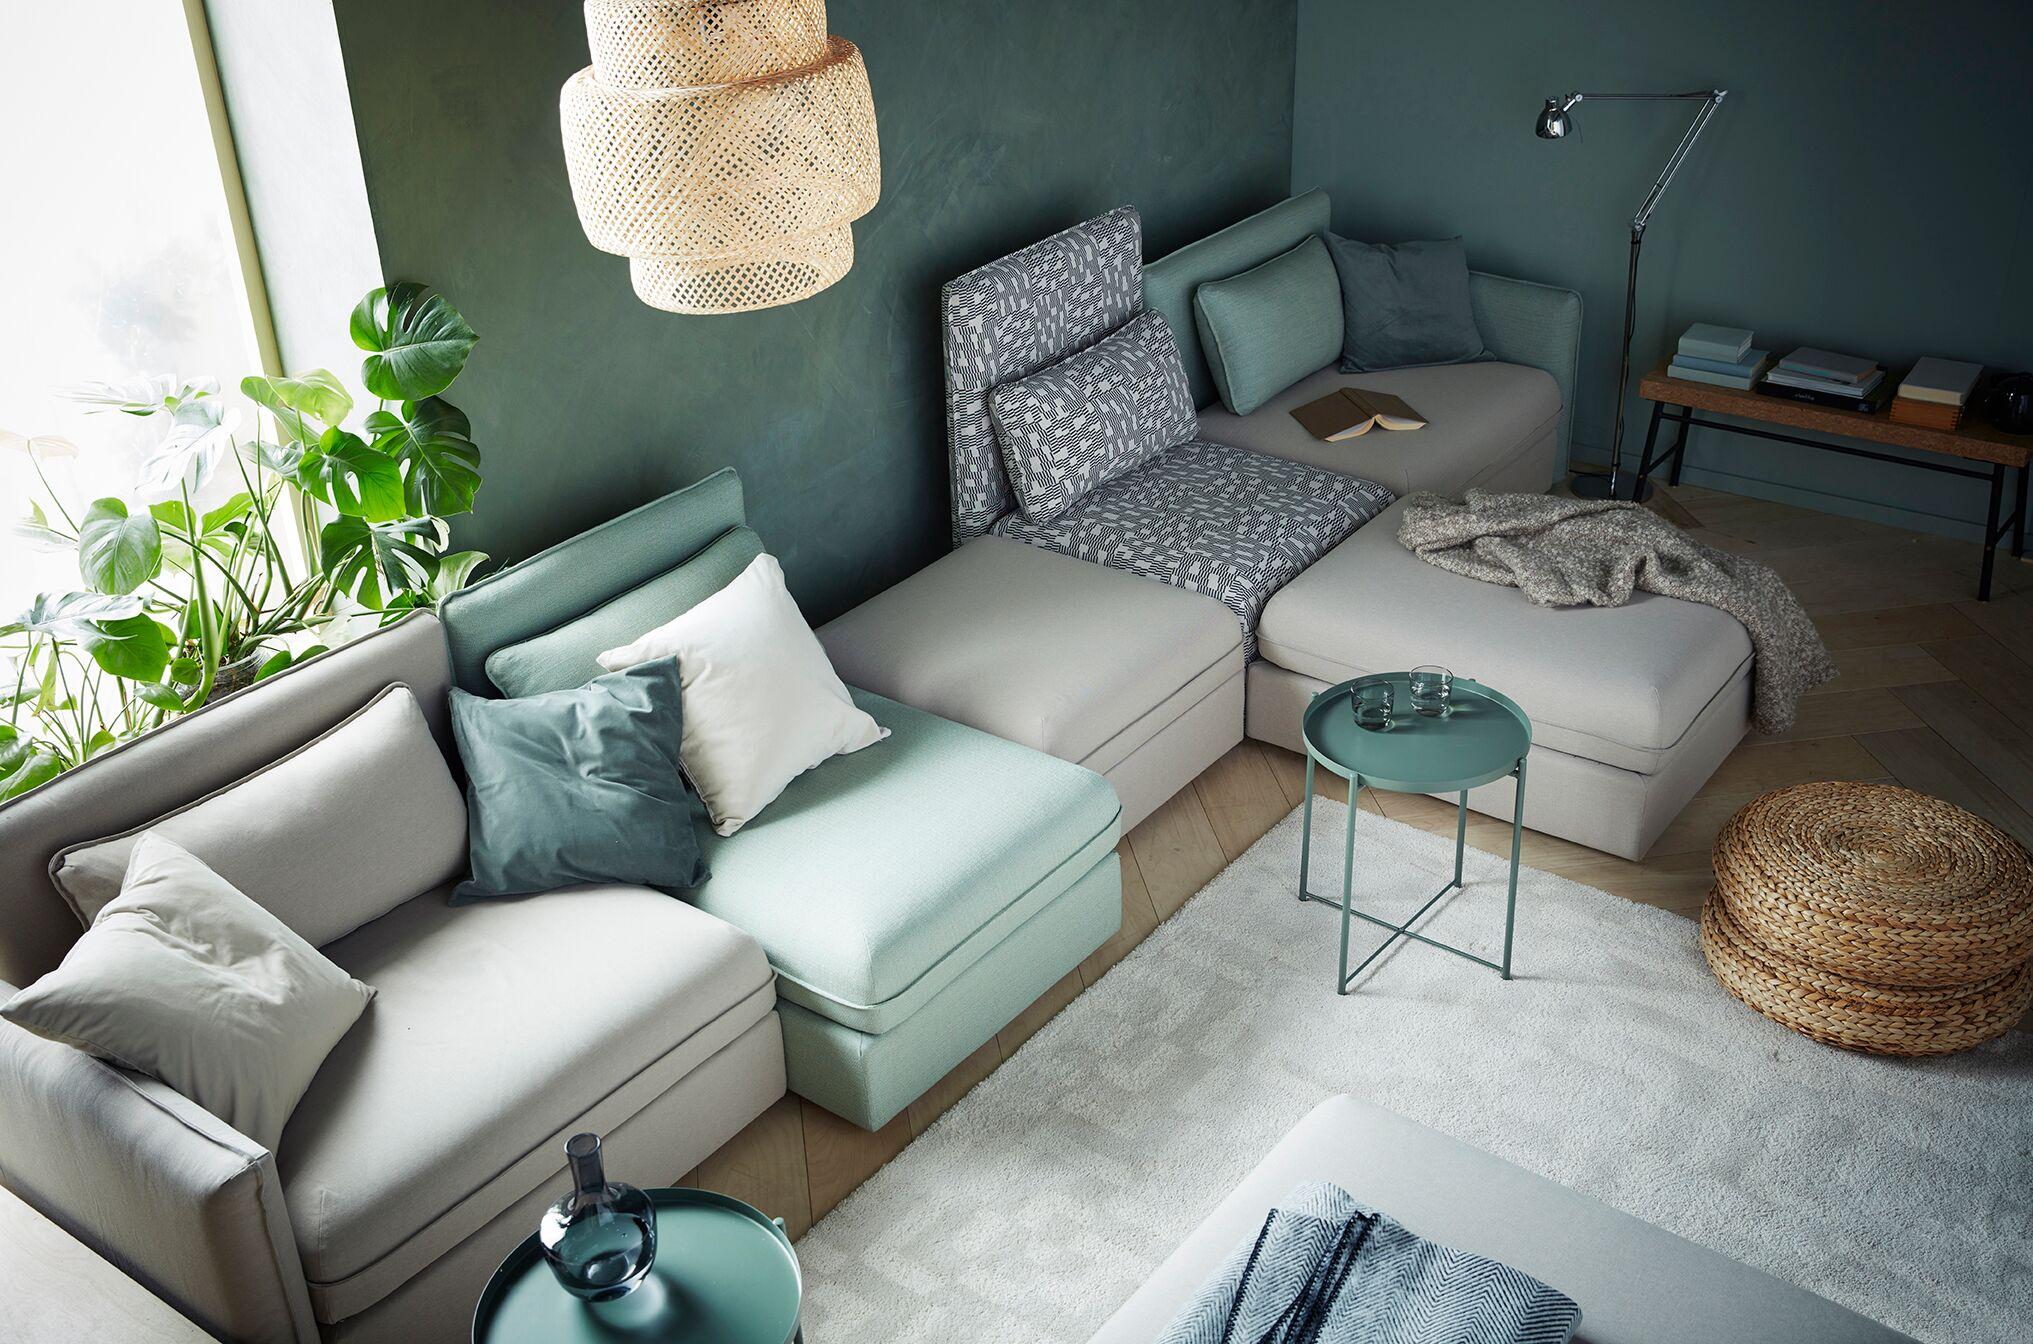 Avance novedades catálogo IKEA 2018 – Virlova Style